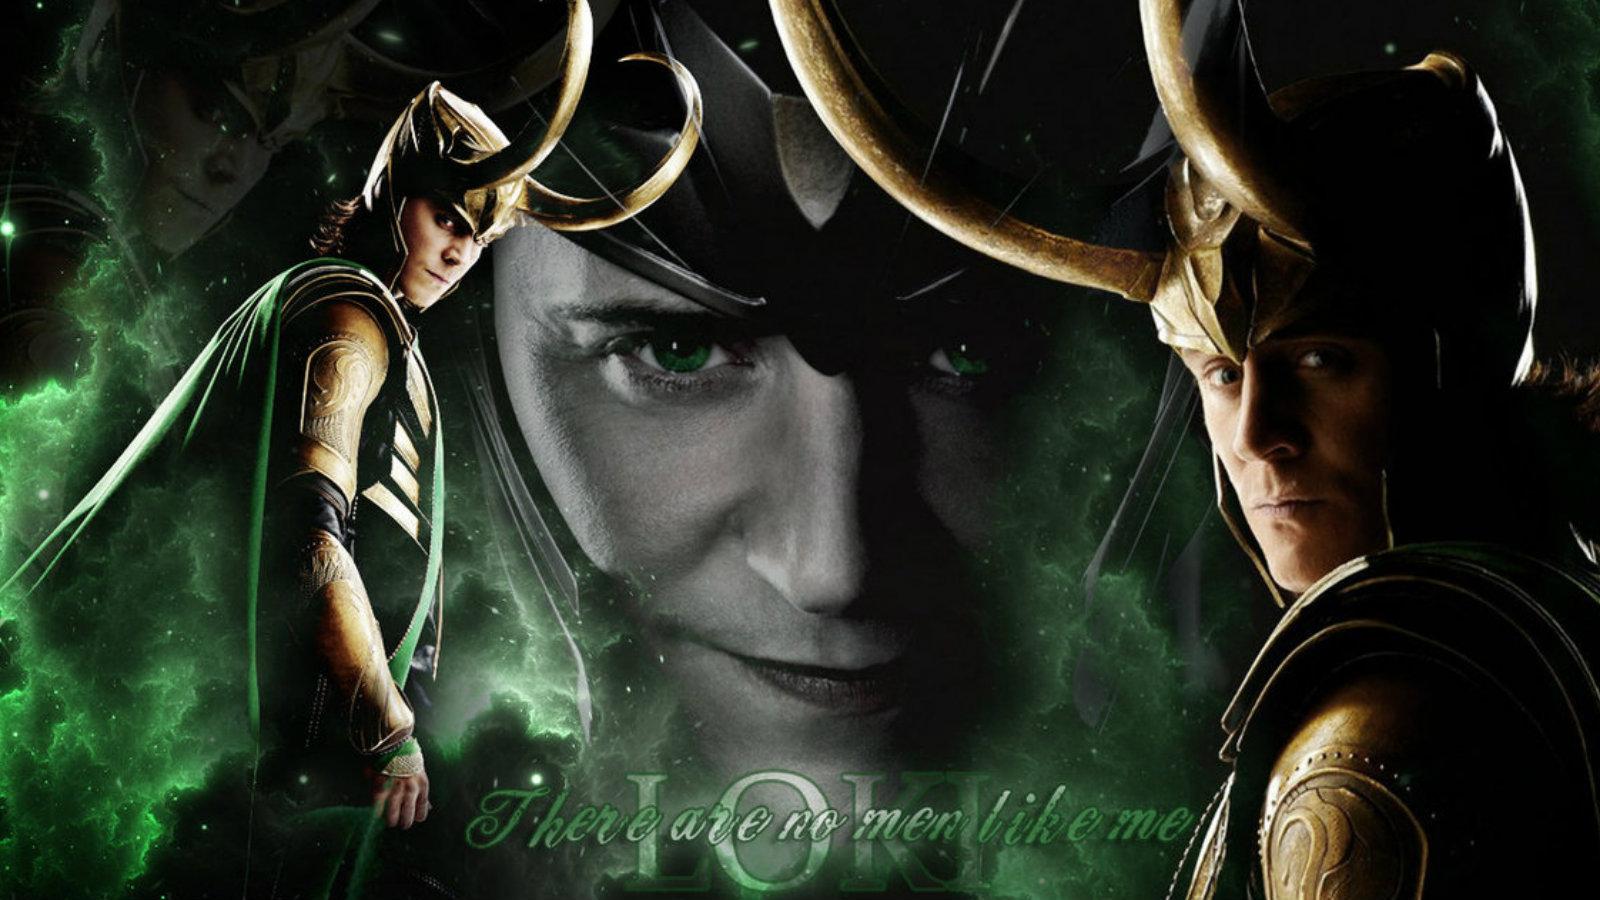 Loki Laufeyson - Loki Thranduil Fanfiction - HD Wallpaper